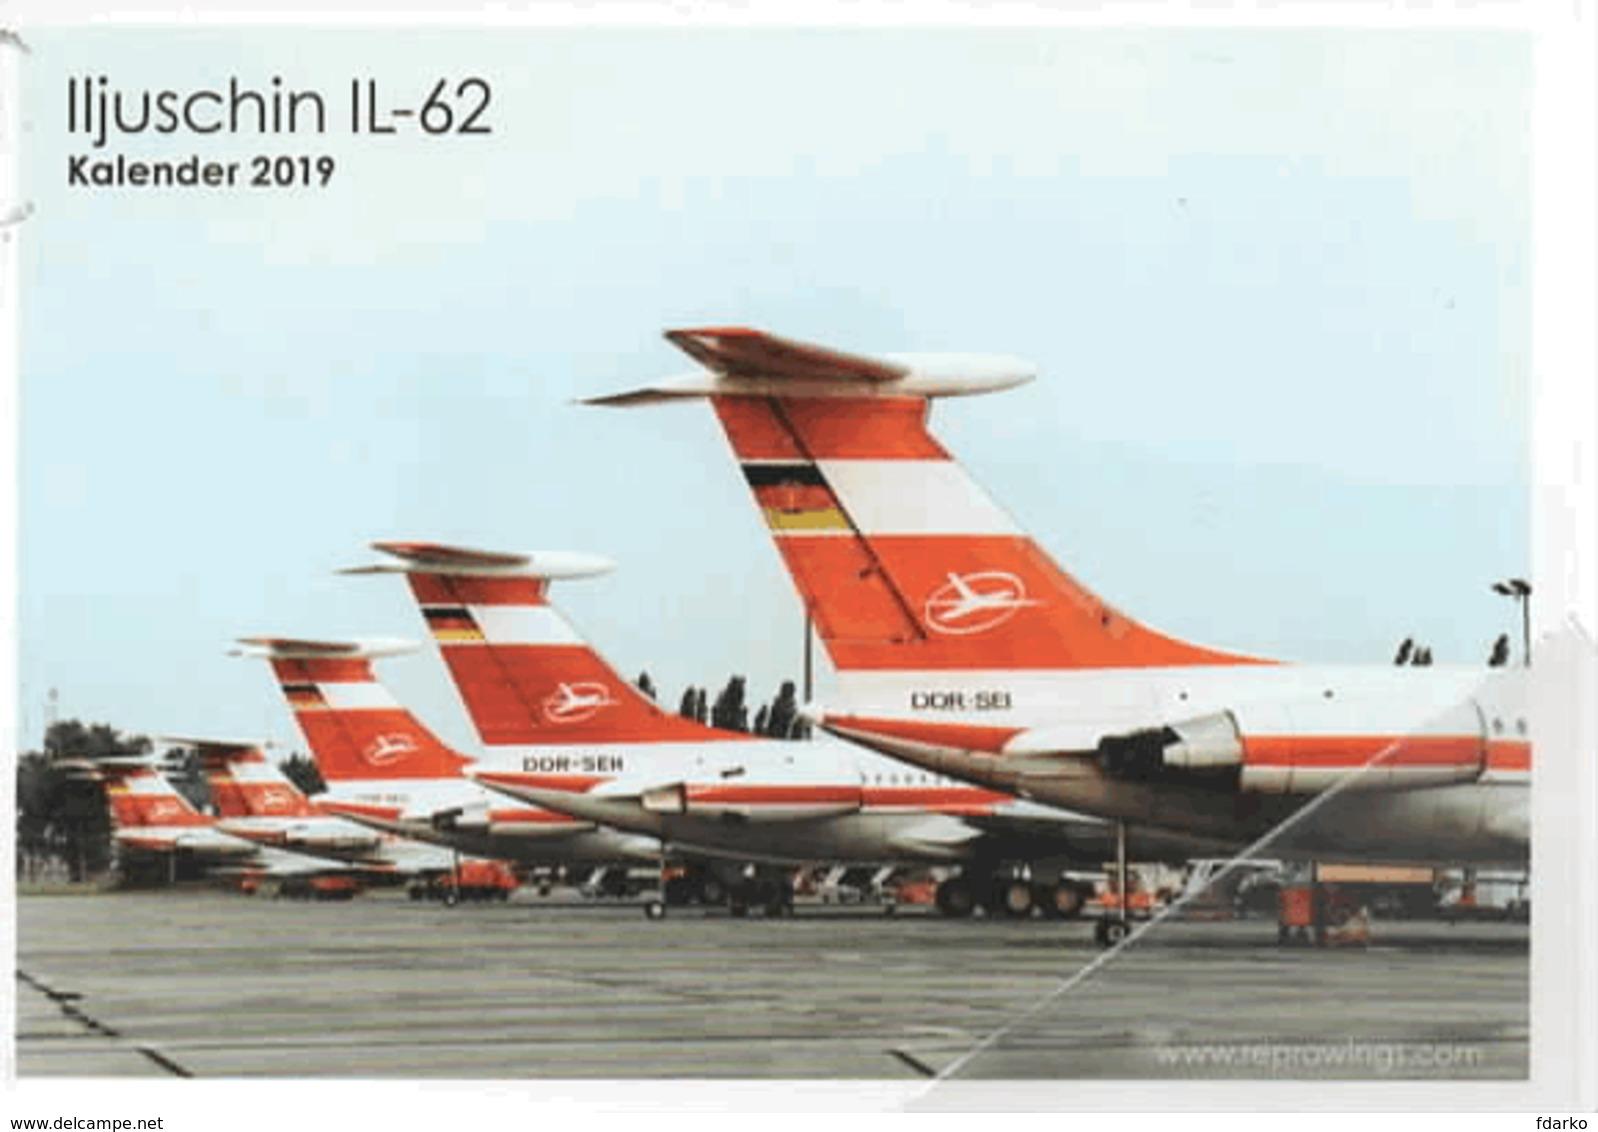 Aerei Iljushin IL-62 Ilyushin Interflug Issue Avion Airplane - Ambulanti